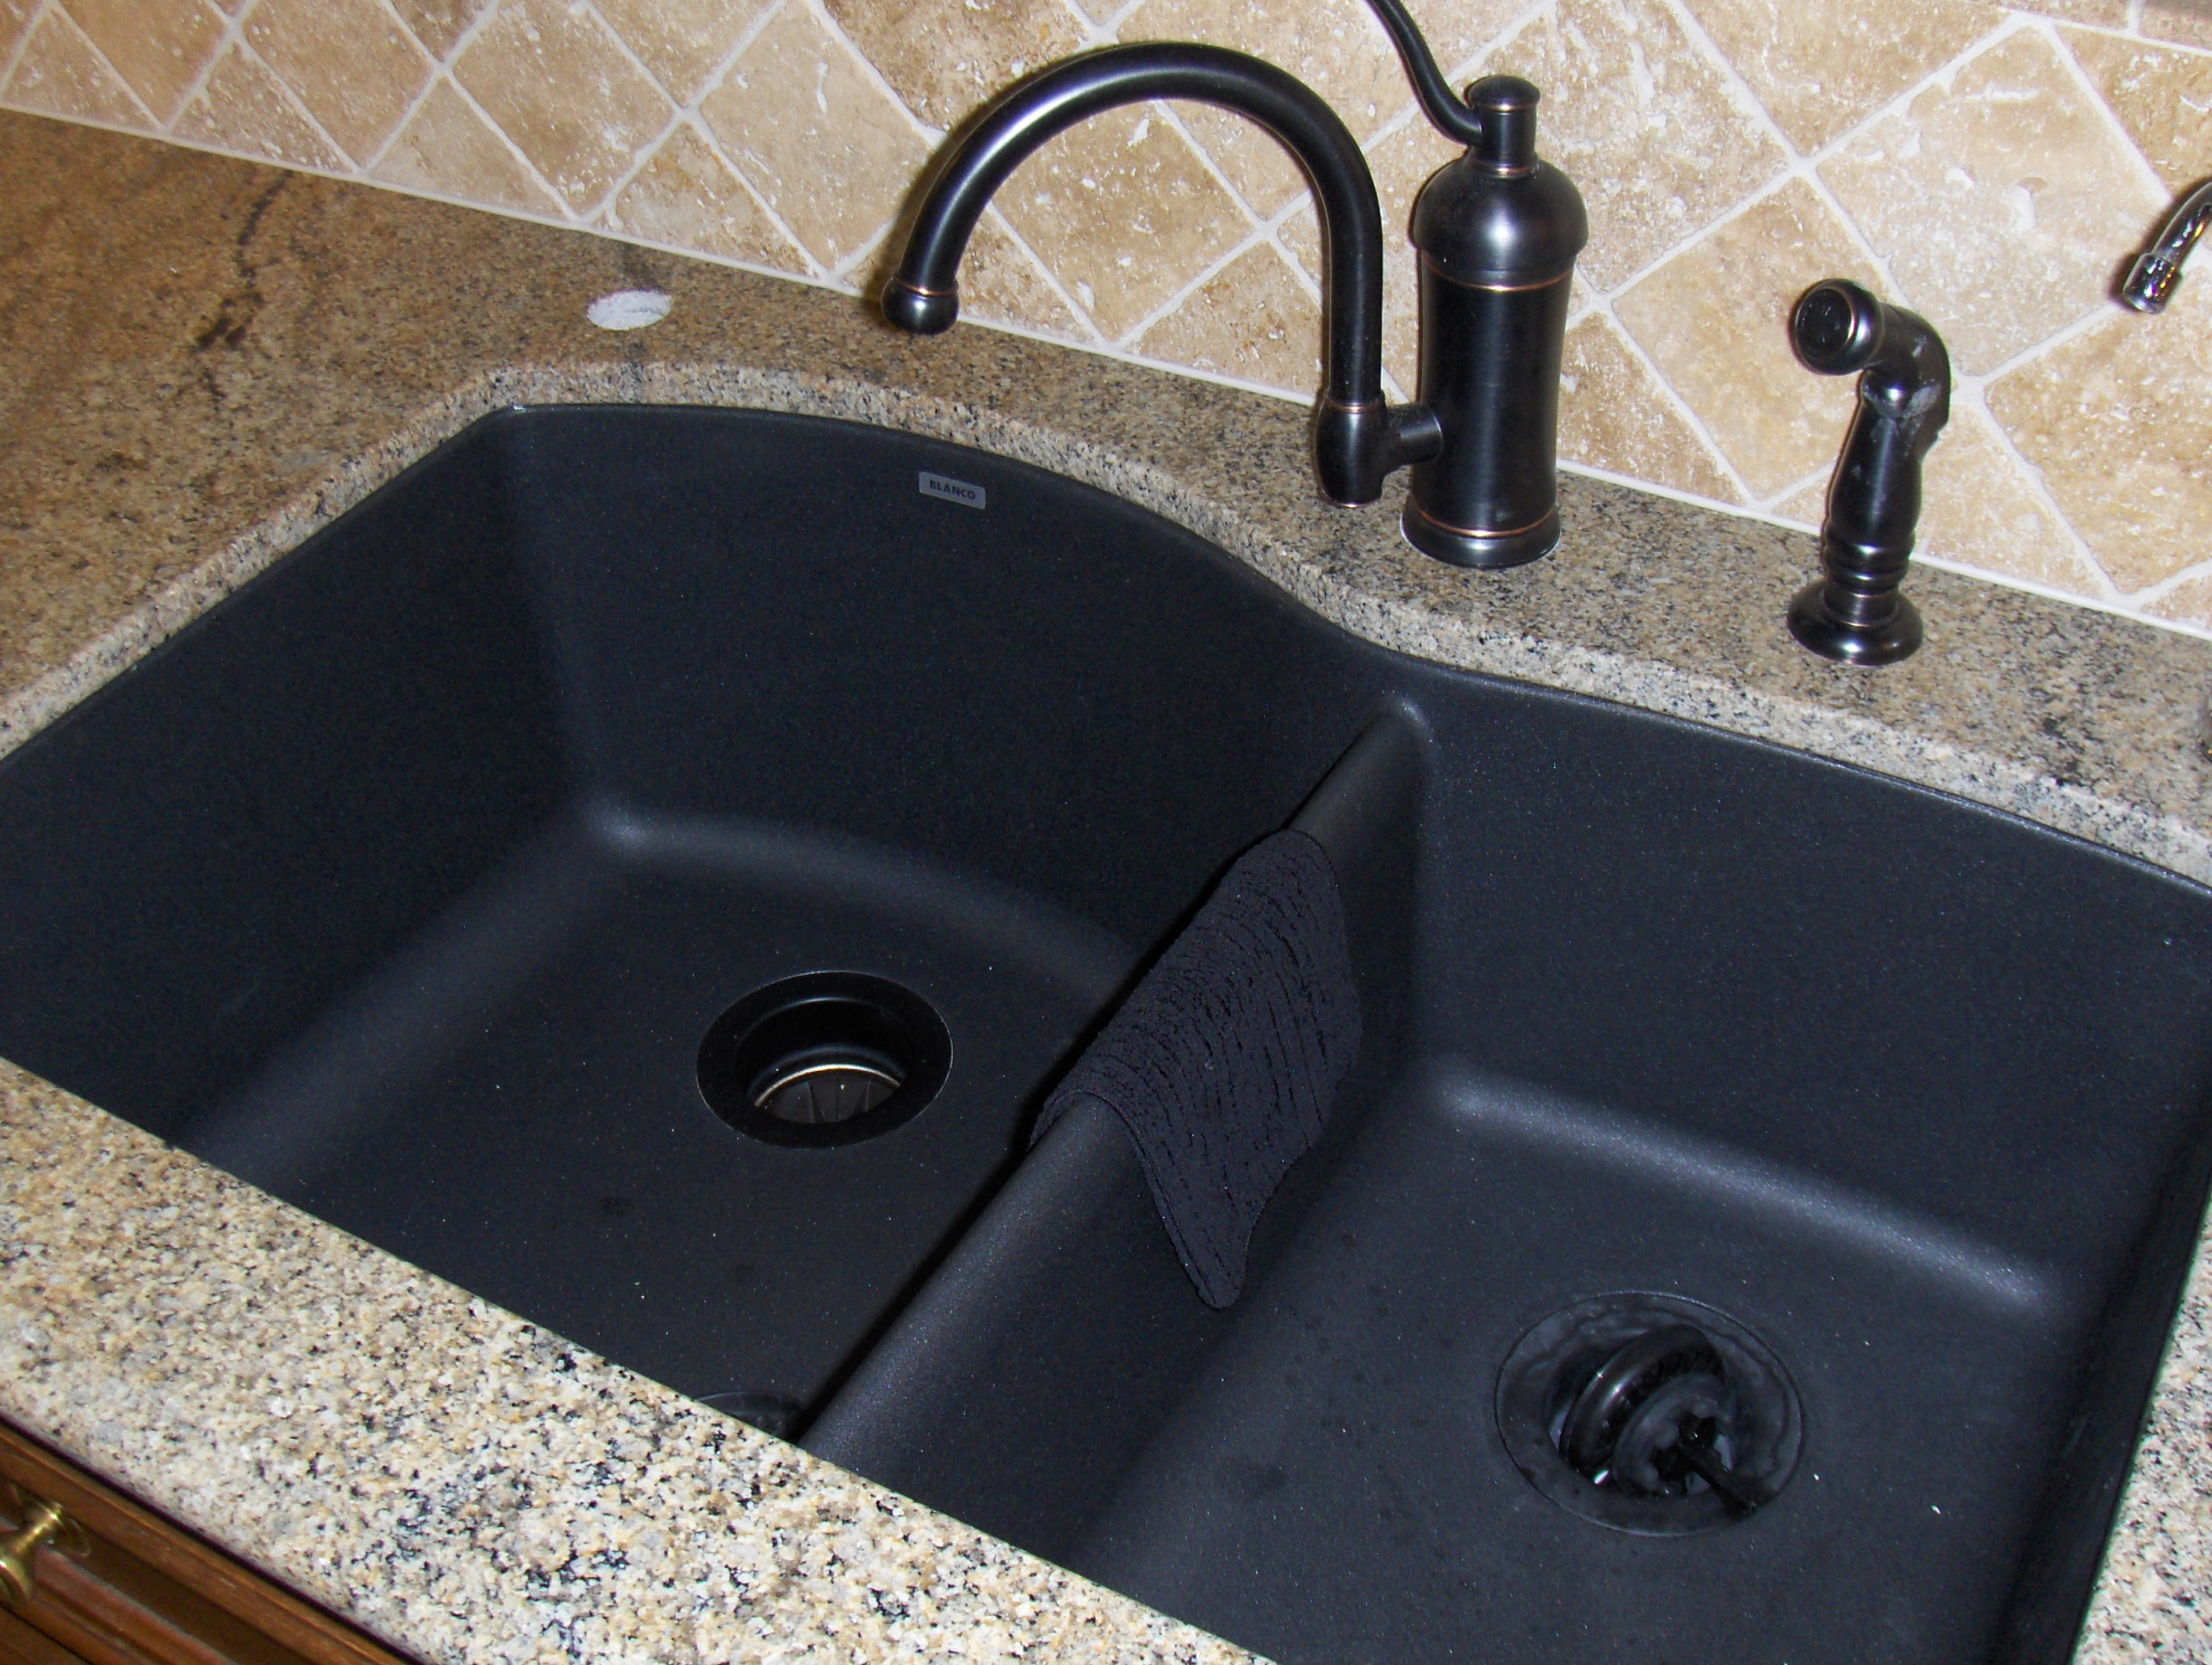 Bathroom Interior Kitchen Furniture Colors Of Granite Black Sinks High Resolution Image Home Kitchen Sink Prices Design Pictures Of Granite Countertops Composite Sinks Reviews Homedesign121